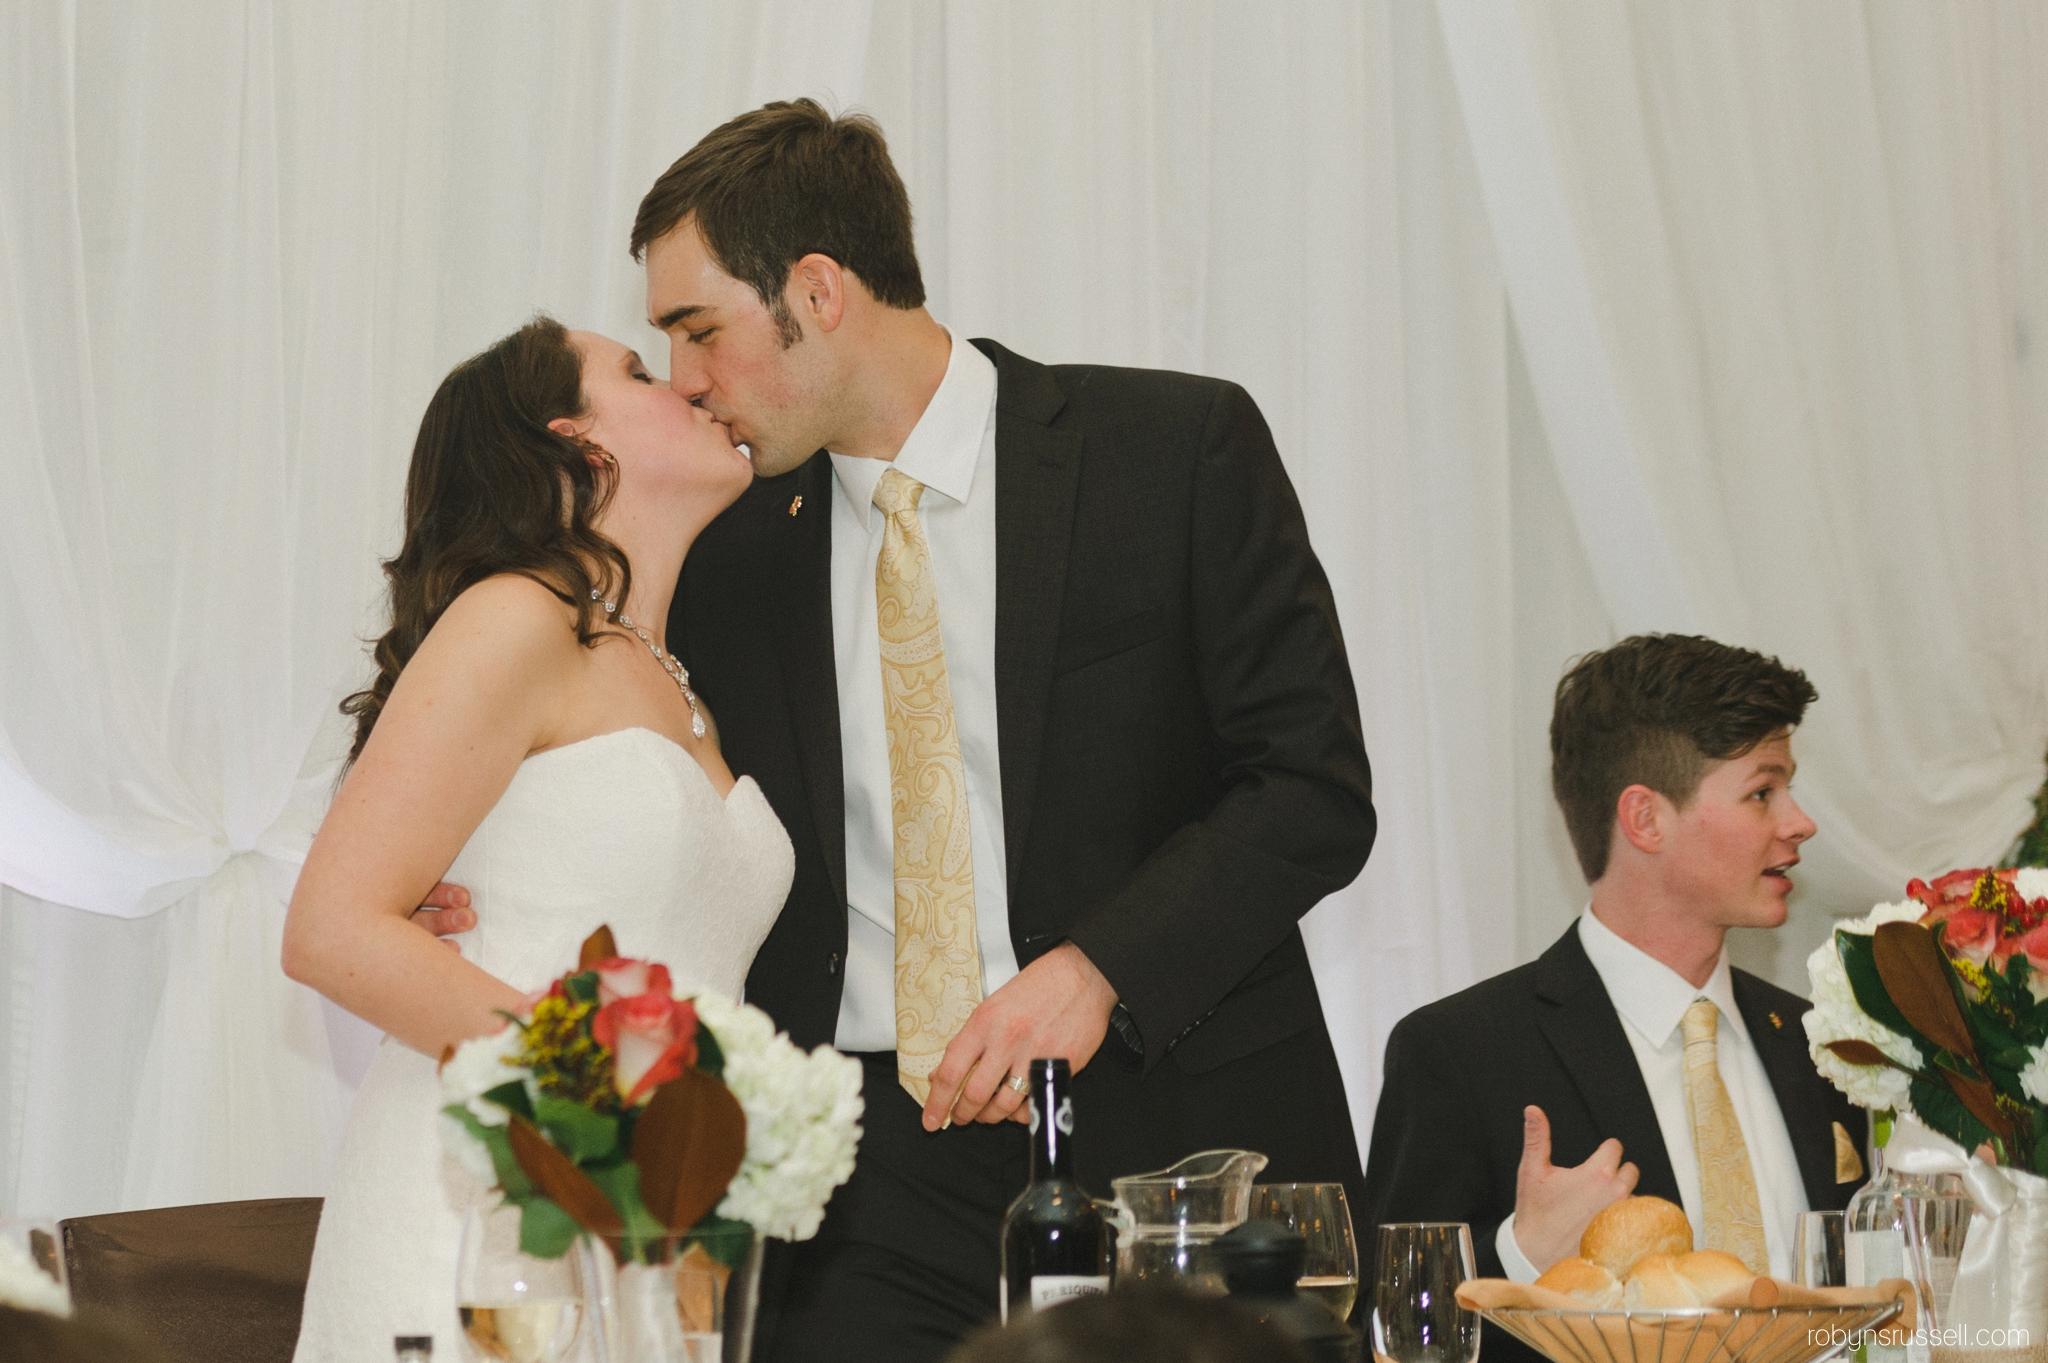 58-kissing-couple-on-wedding-day.jpg